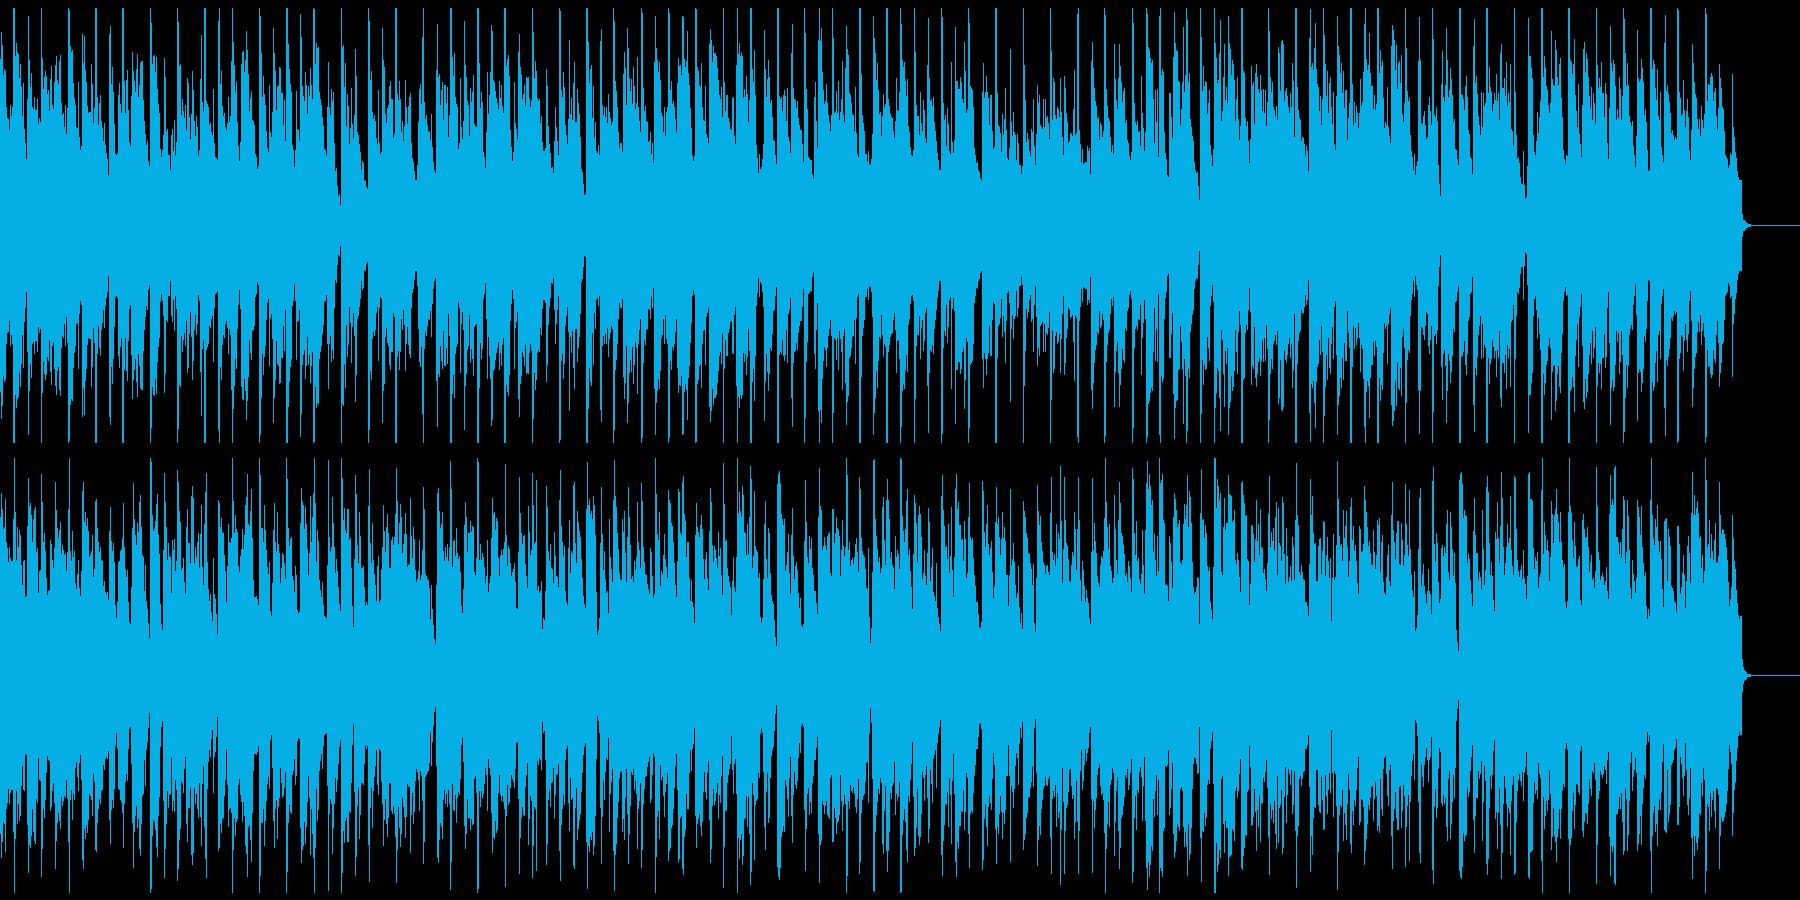 Handel's arrangement for the award ceremony's reproduced waveform